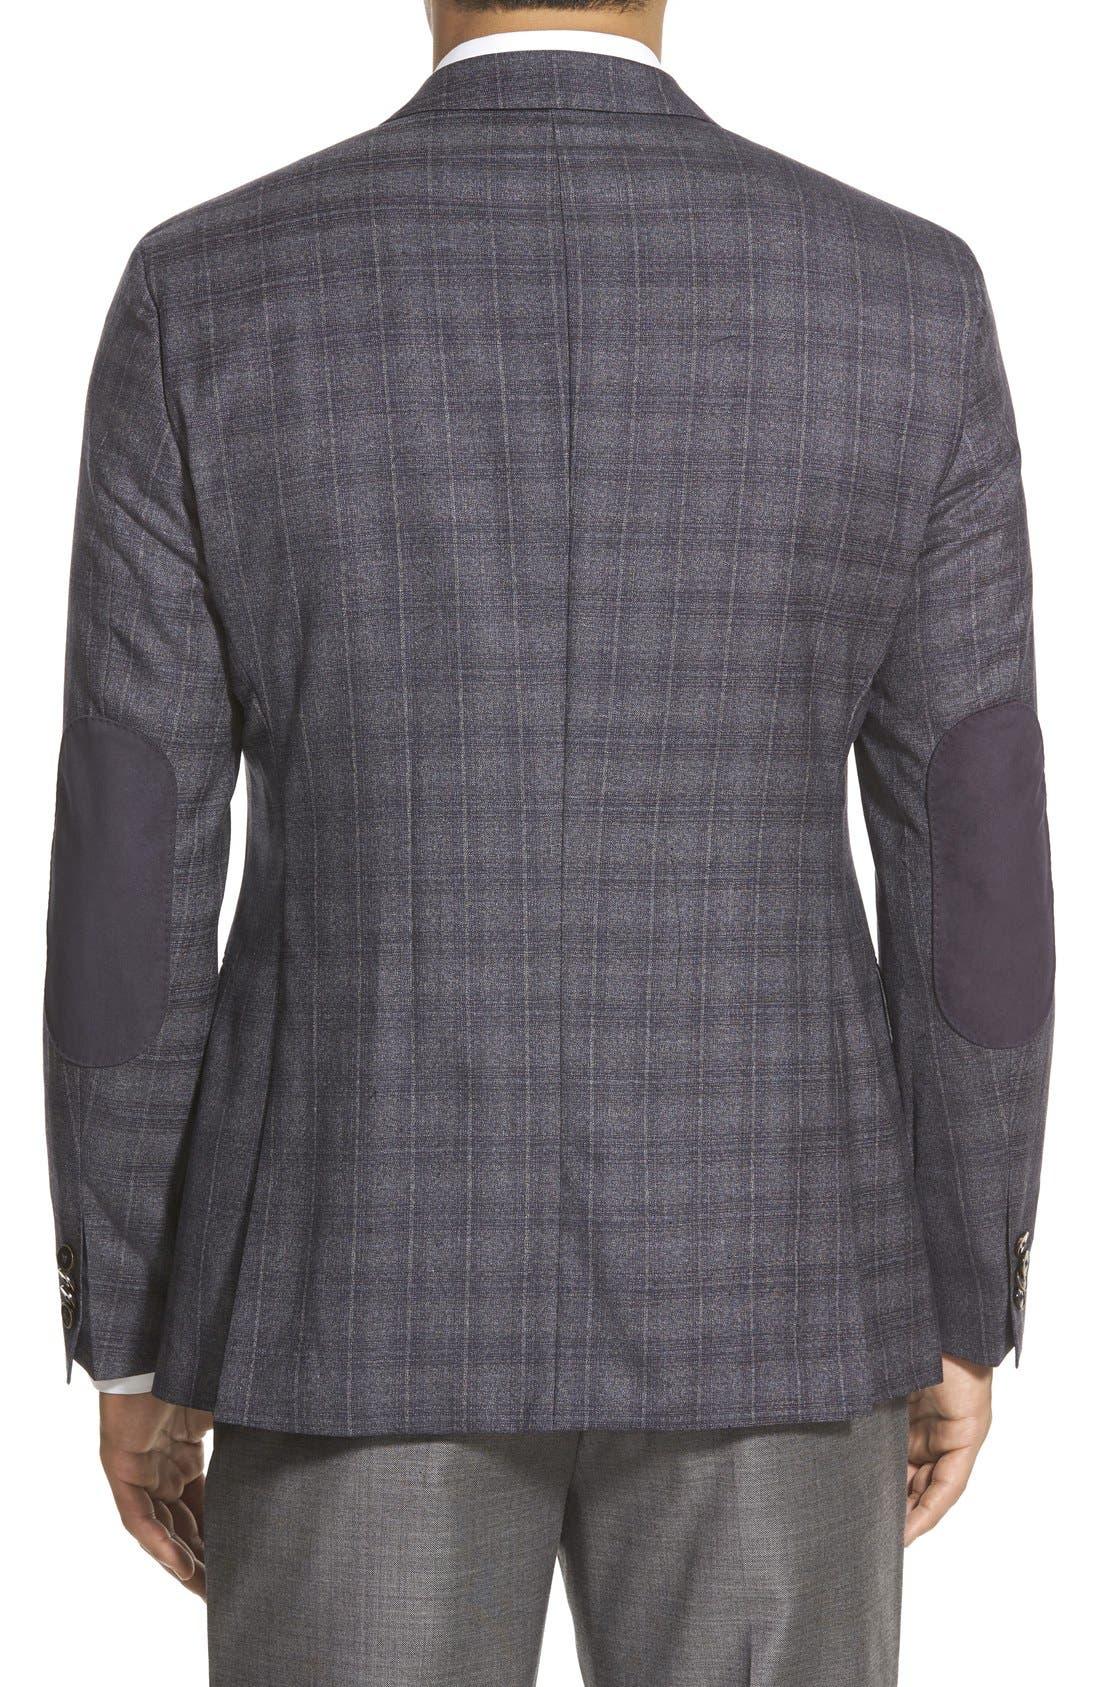 ZZDNUHUGO BOSS, BOSS 'Jayden' Trim Fit Plaid Wool Sport Coat, Alternate thumbnail 2, color, 420